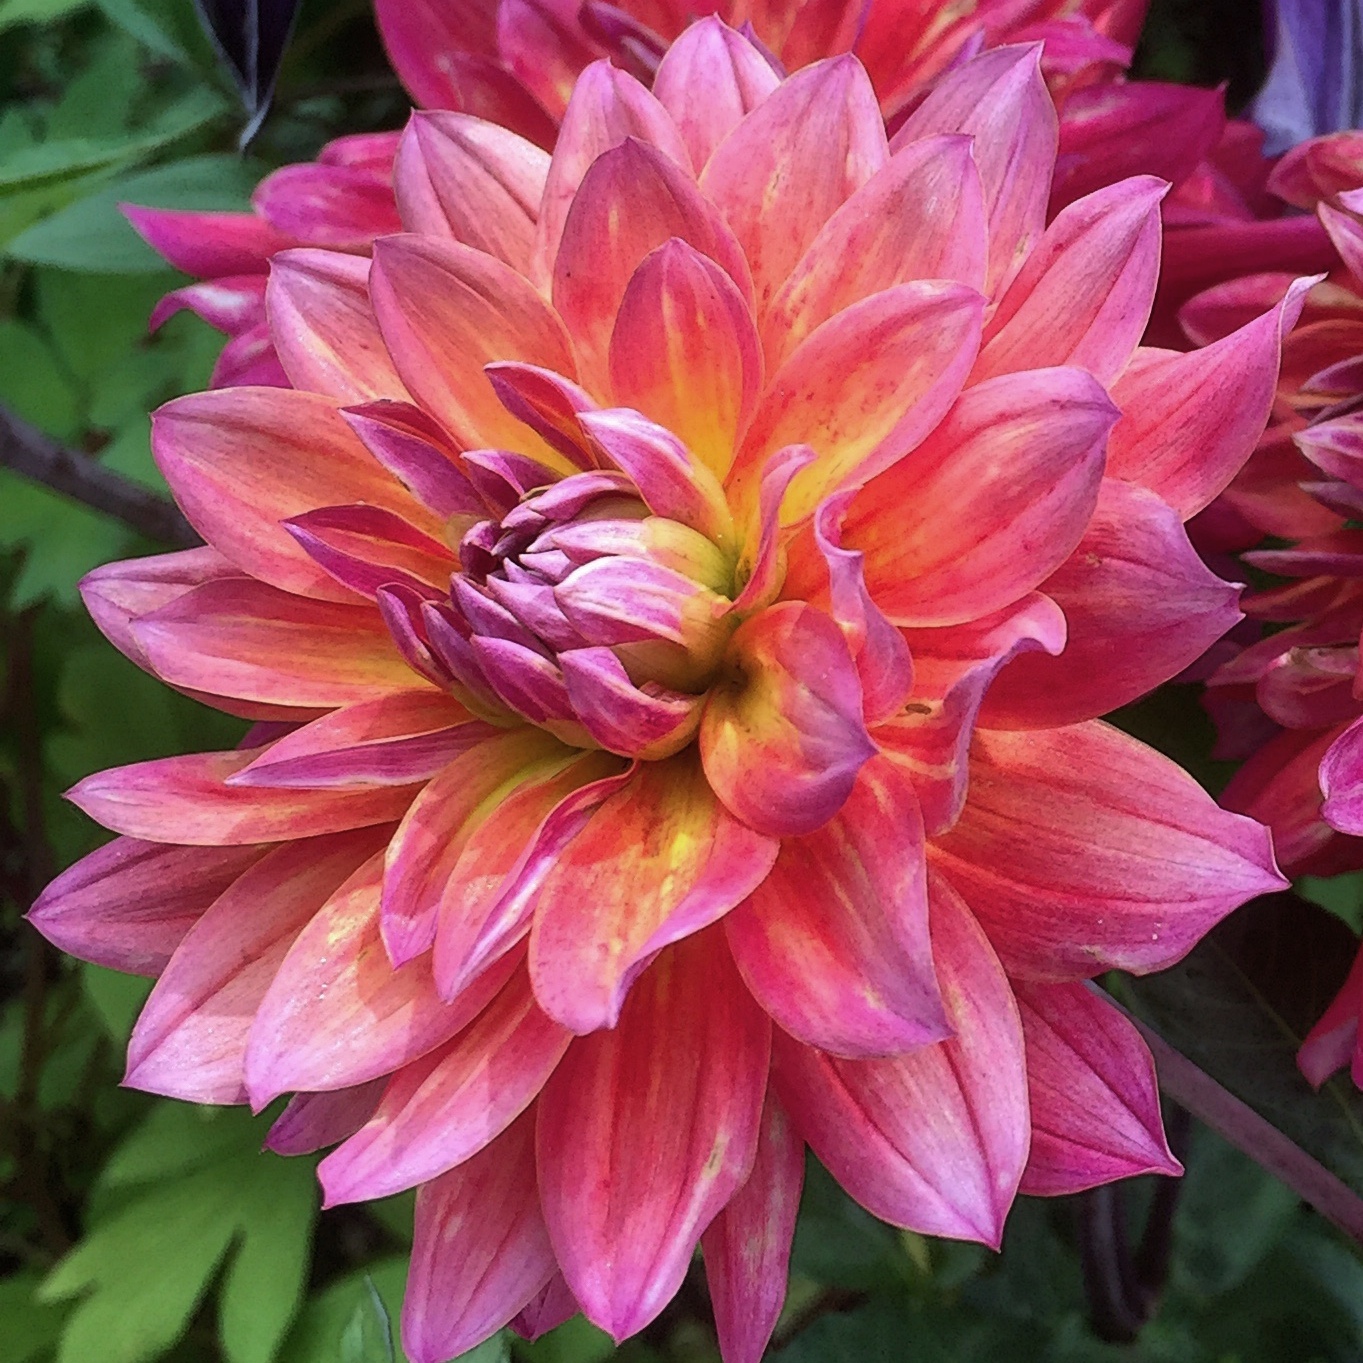 Flower Blooms for each season